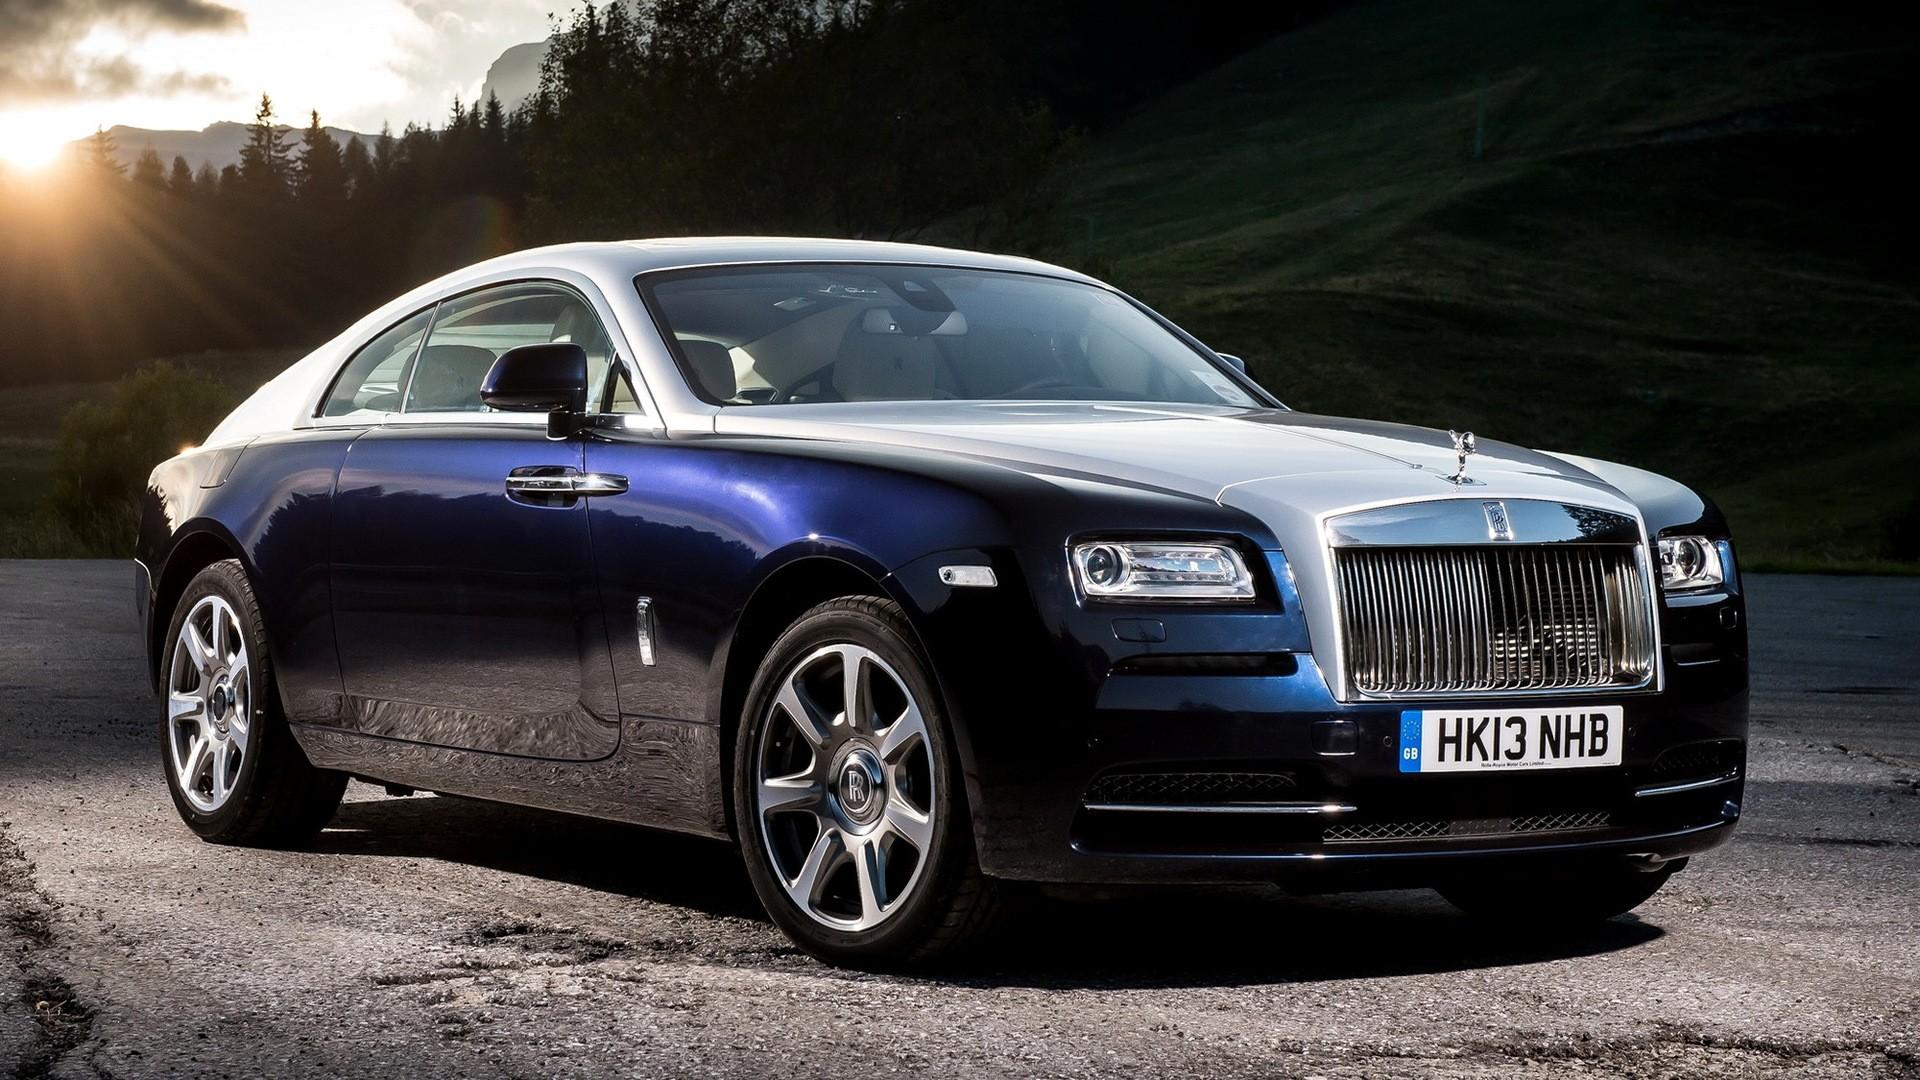 Rolls Royce Wraith Desktop Wallpaper